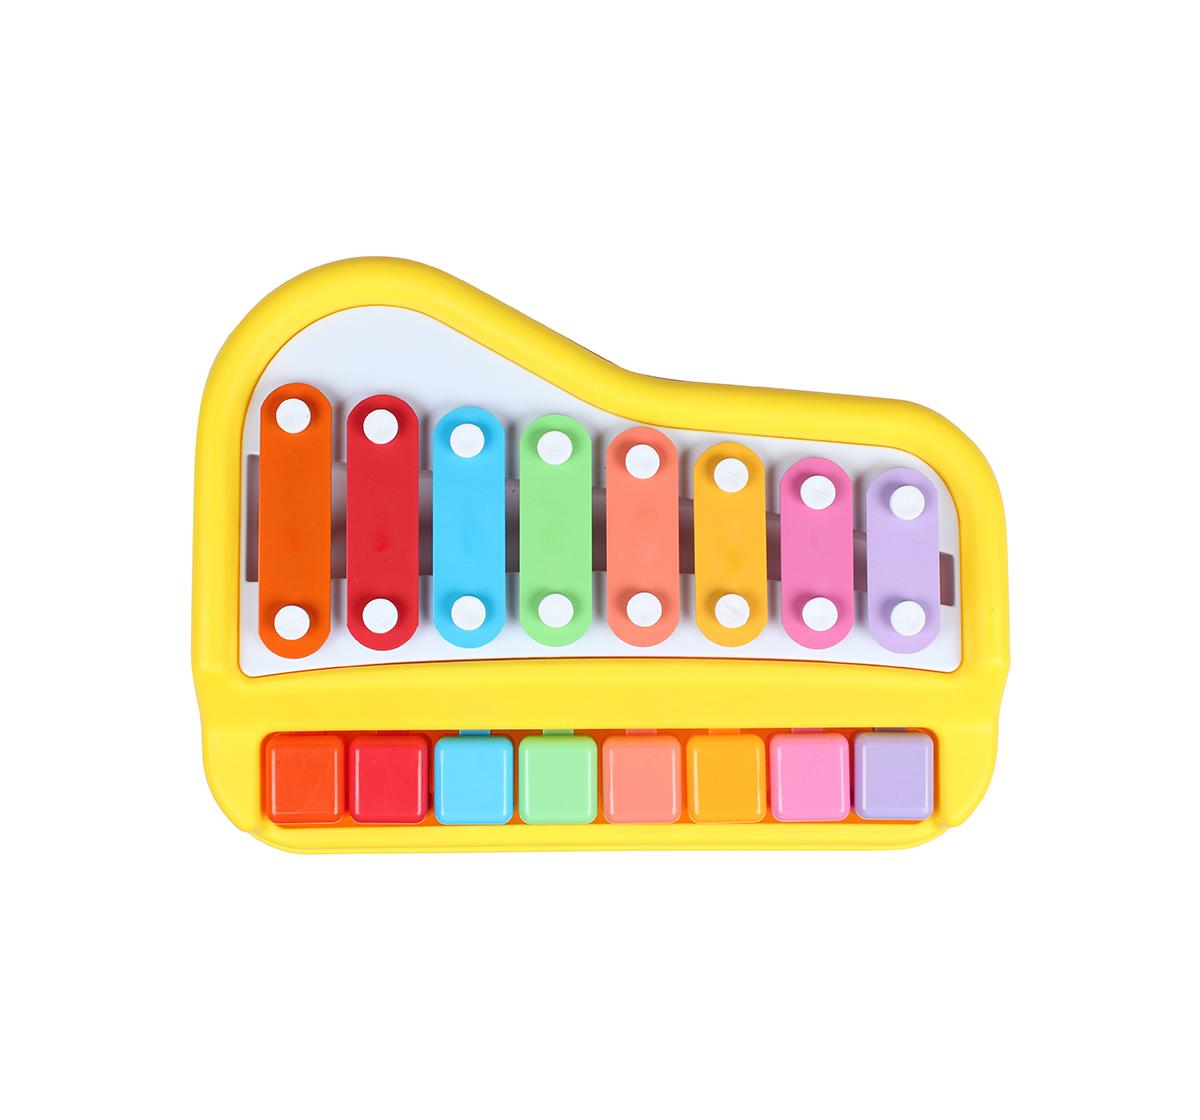 Shooting Star | Shooting Star Xylophone Piano Set for Kids age 18M + (Yellow)